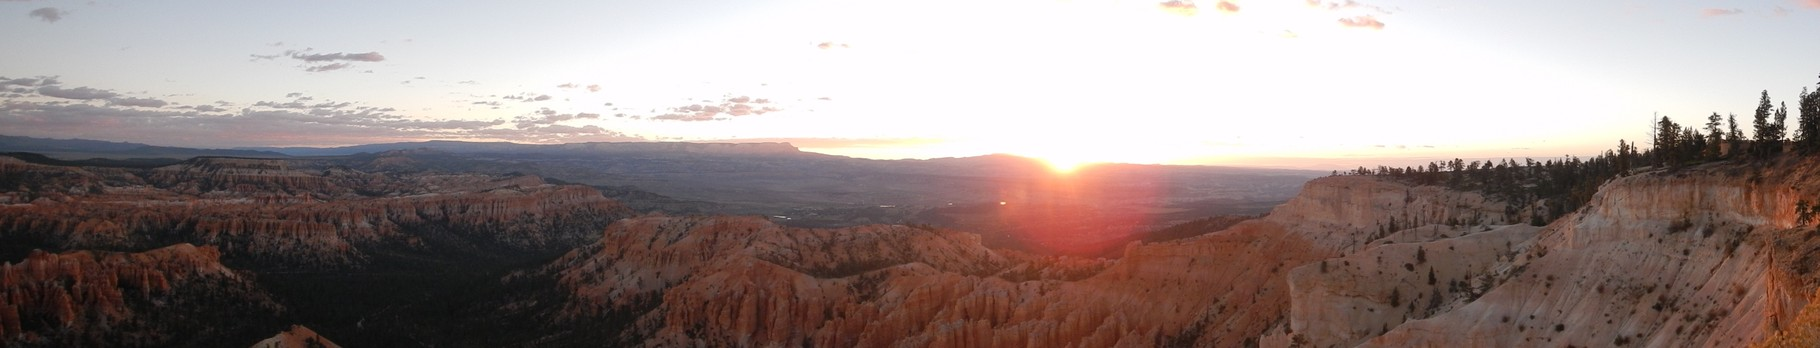 Sonnenaufgang über dem Bryce Canyon